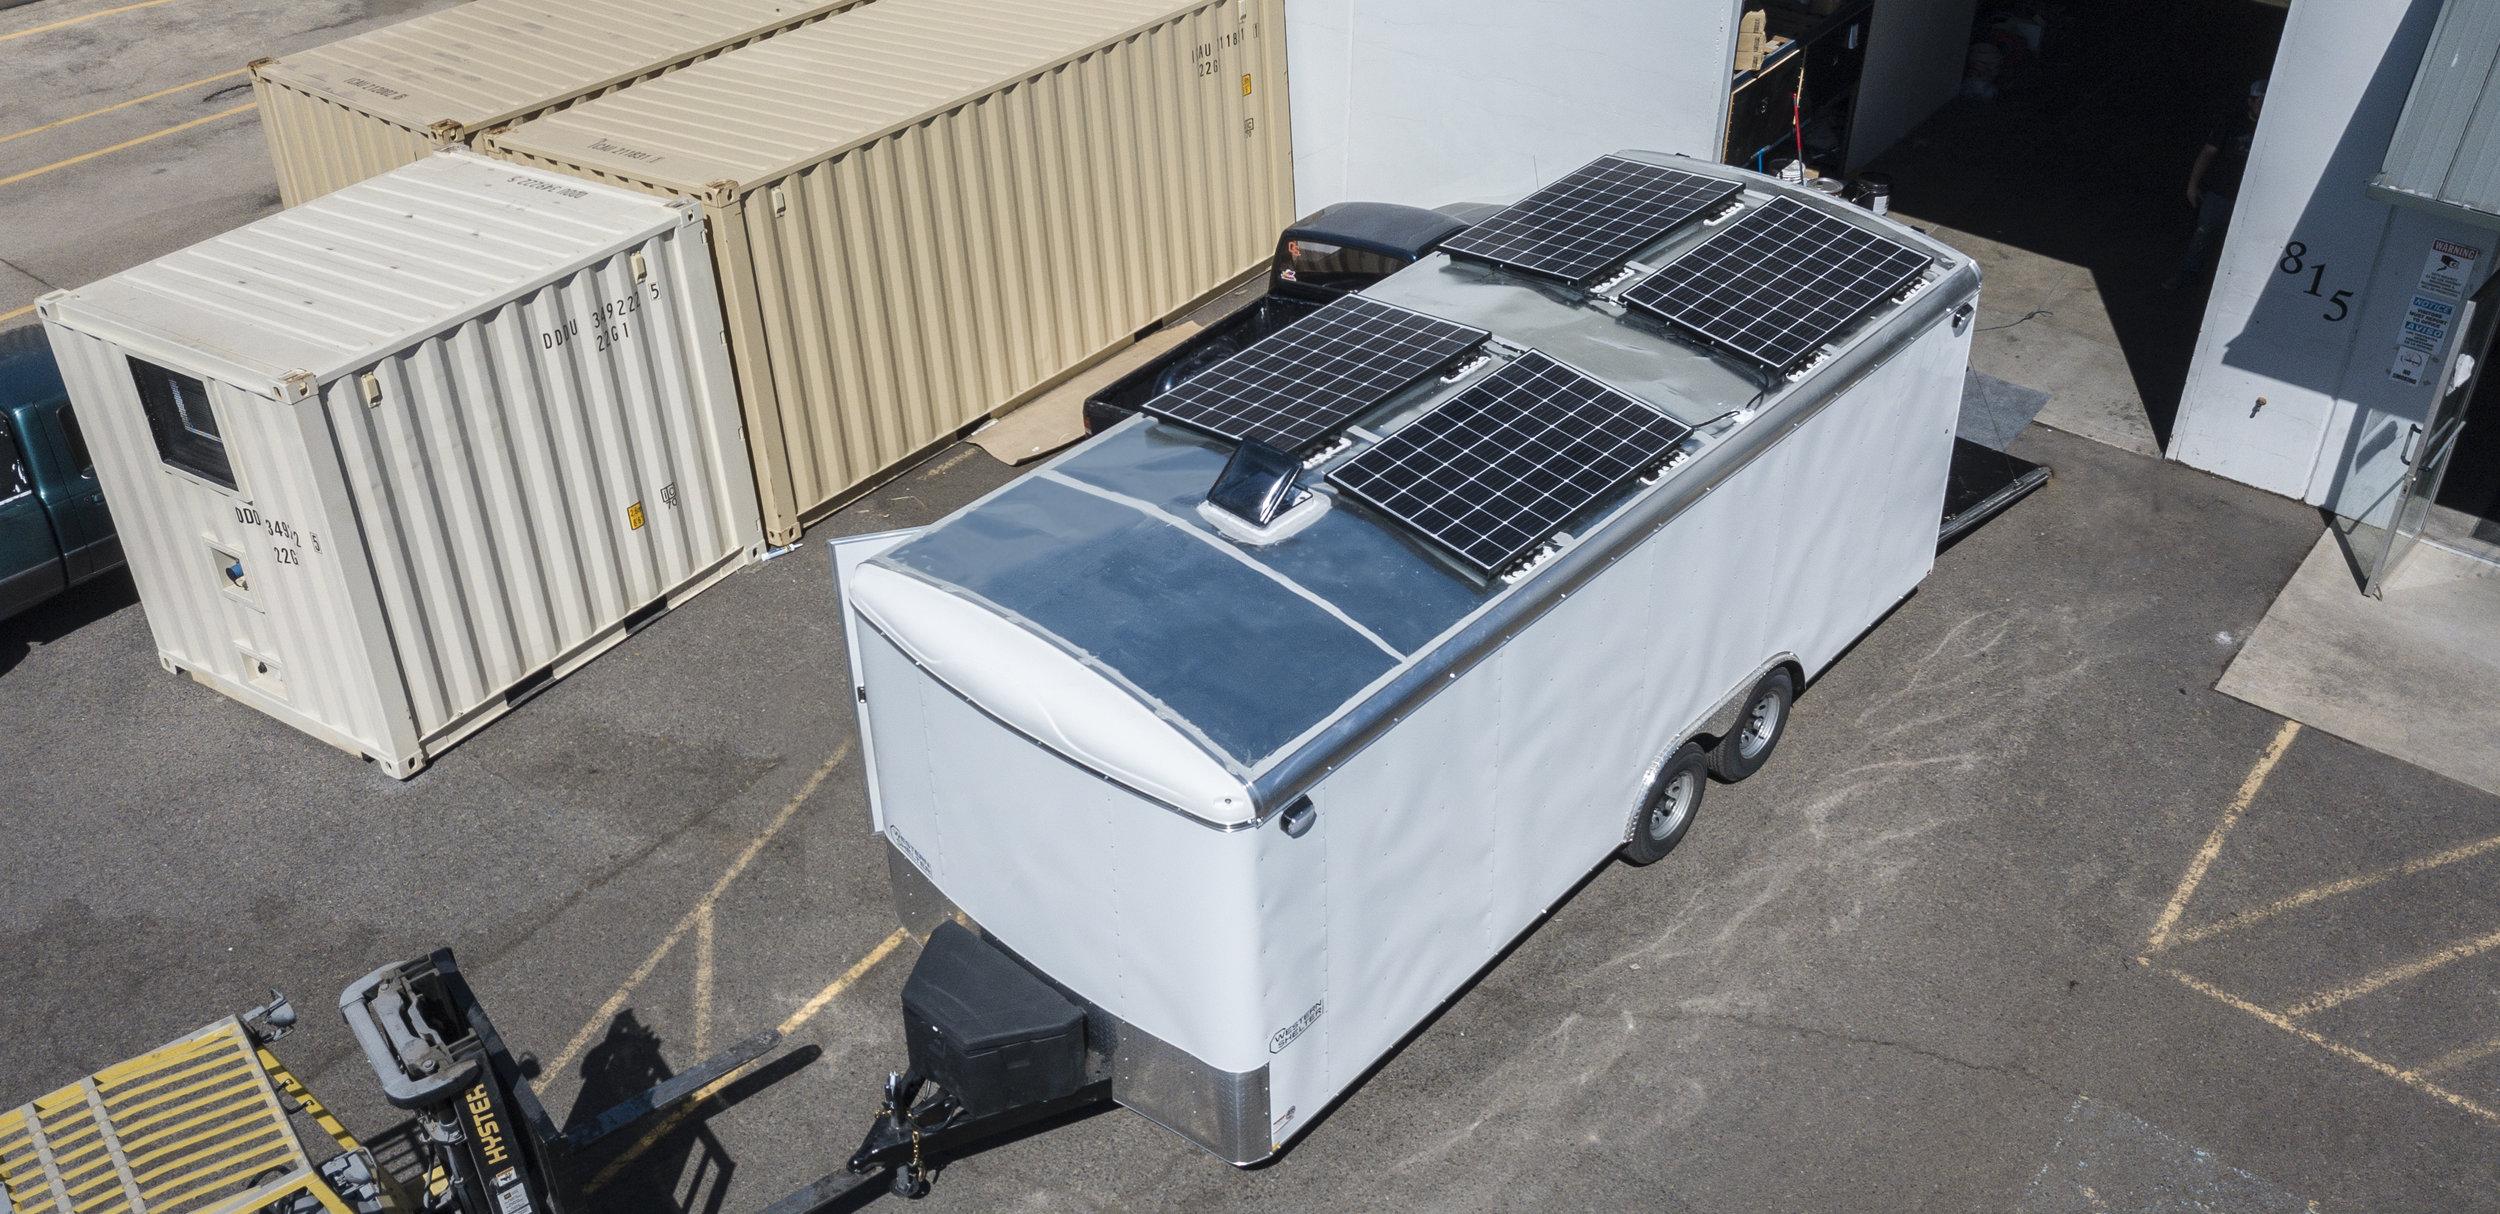 SolarT_drone.jpg